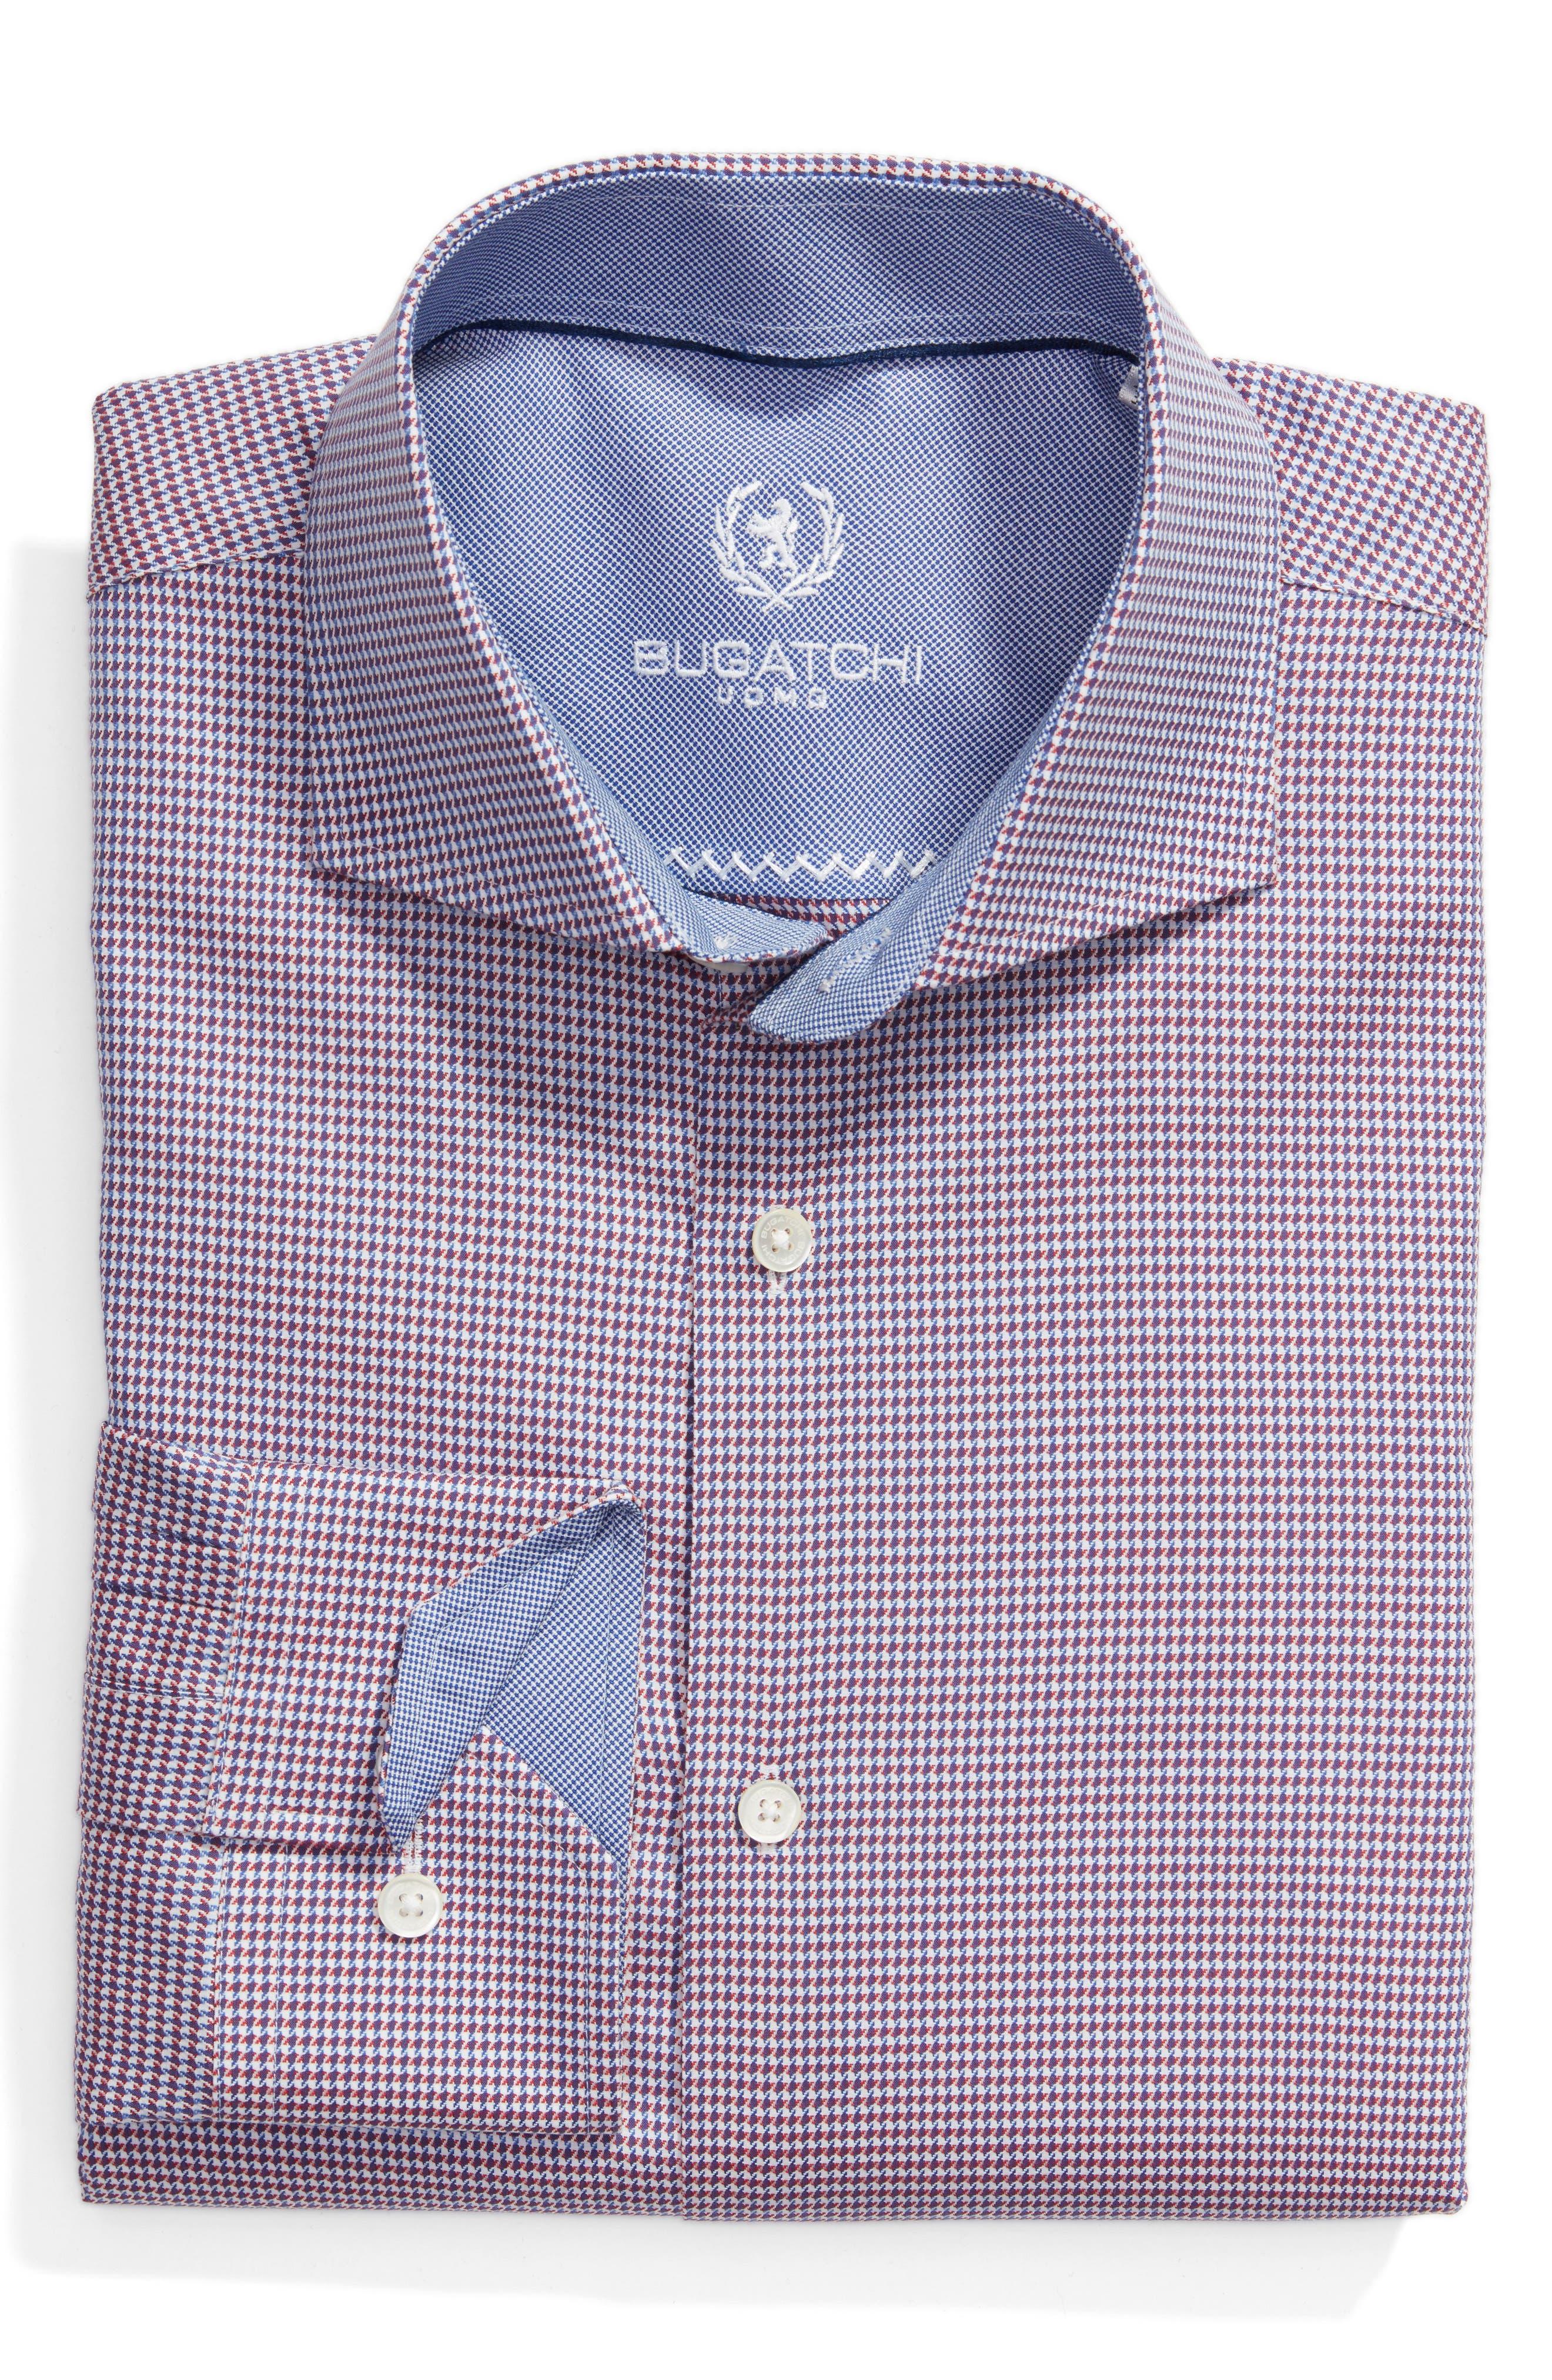 Trim Fit Houndstooth Dress Shirt,                             Main thumbnail 1, color,                             602